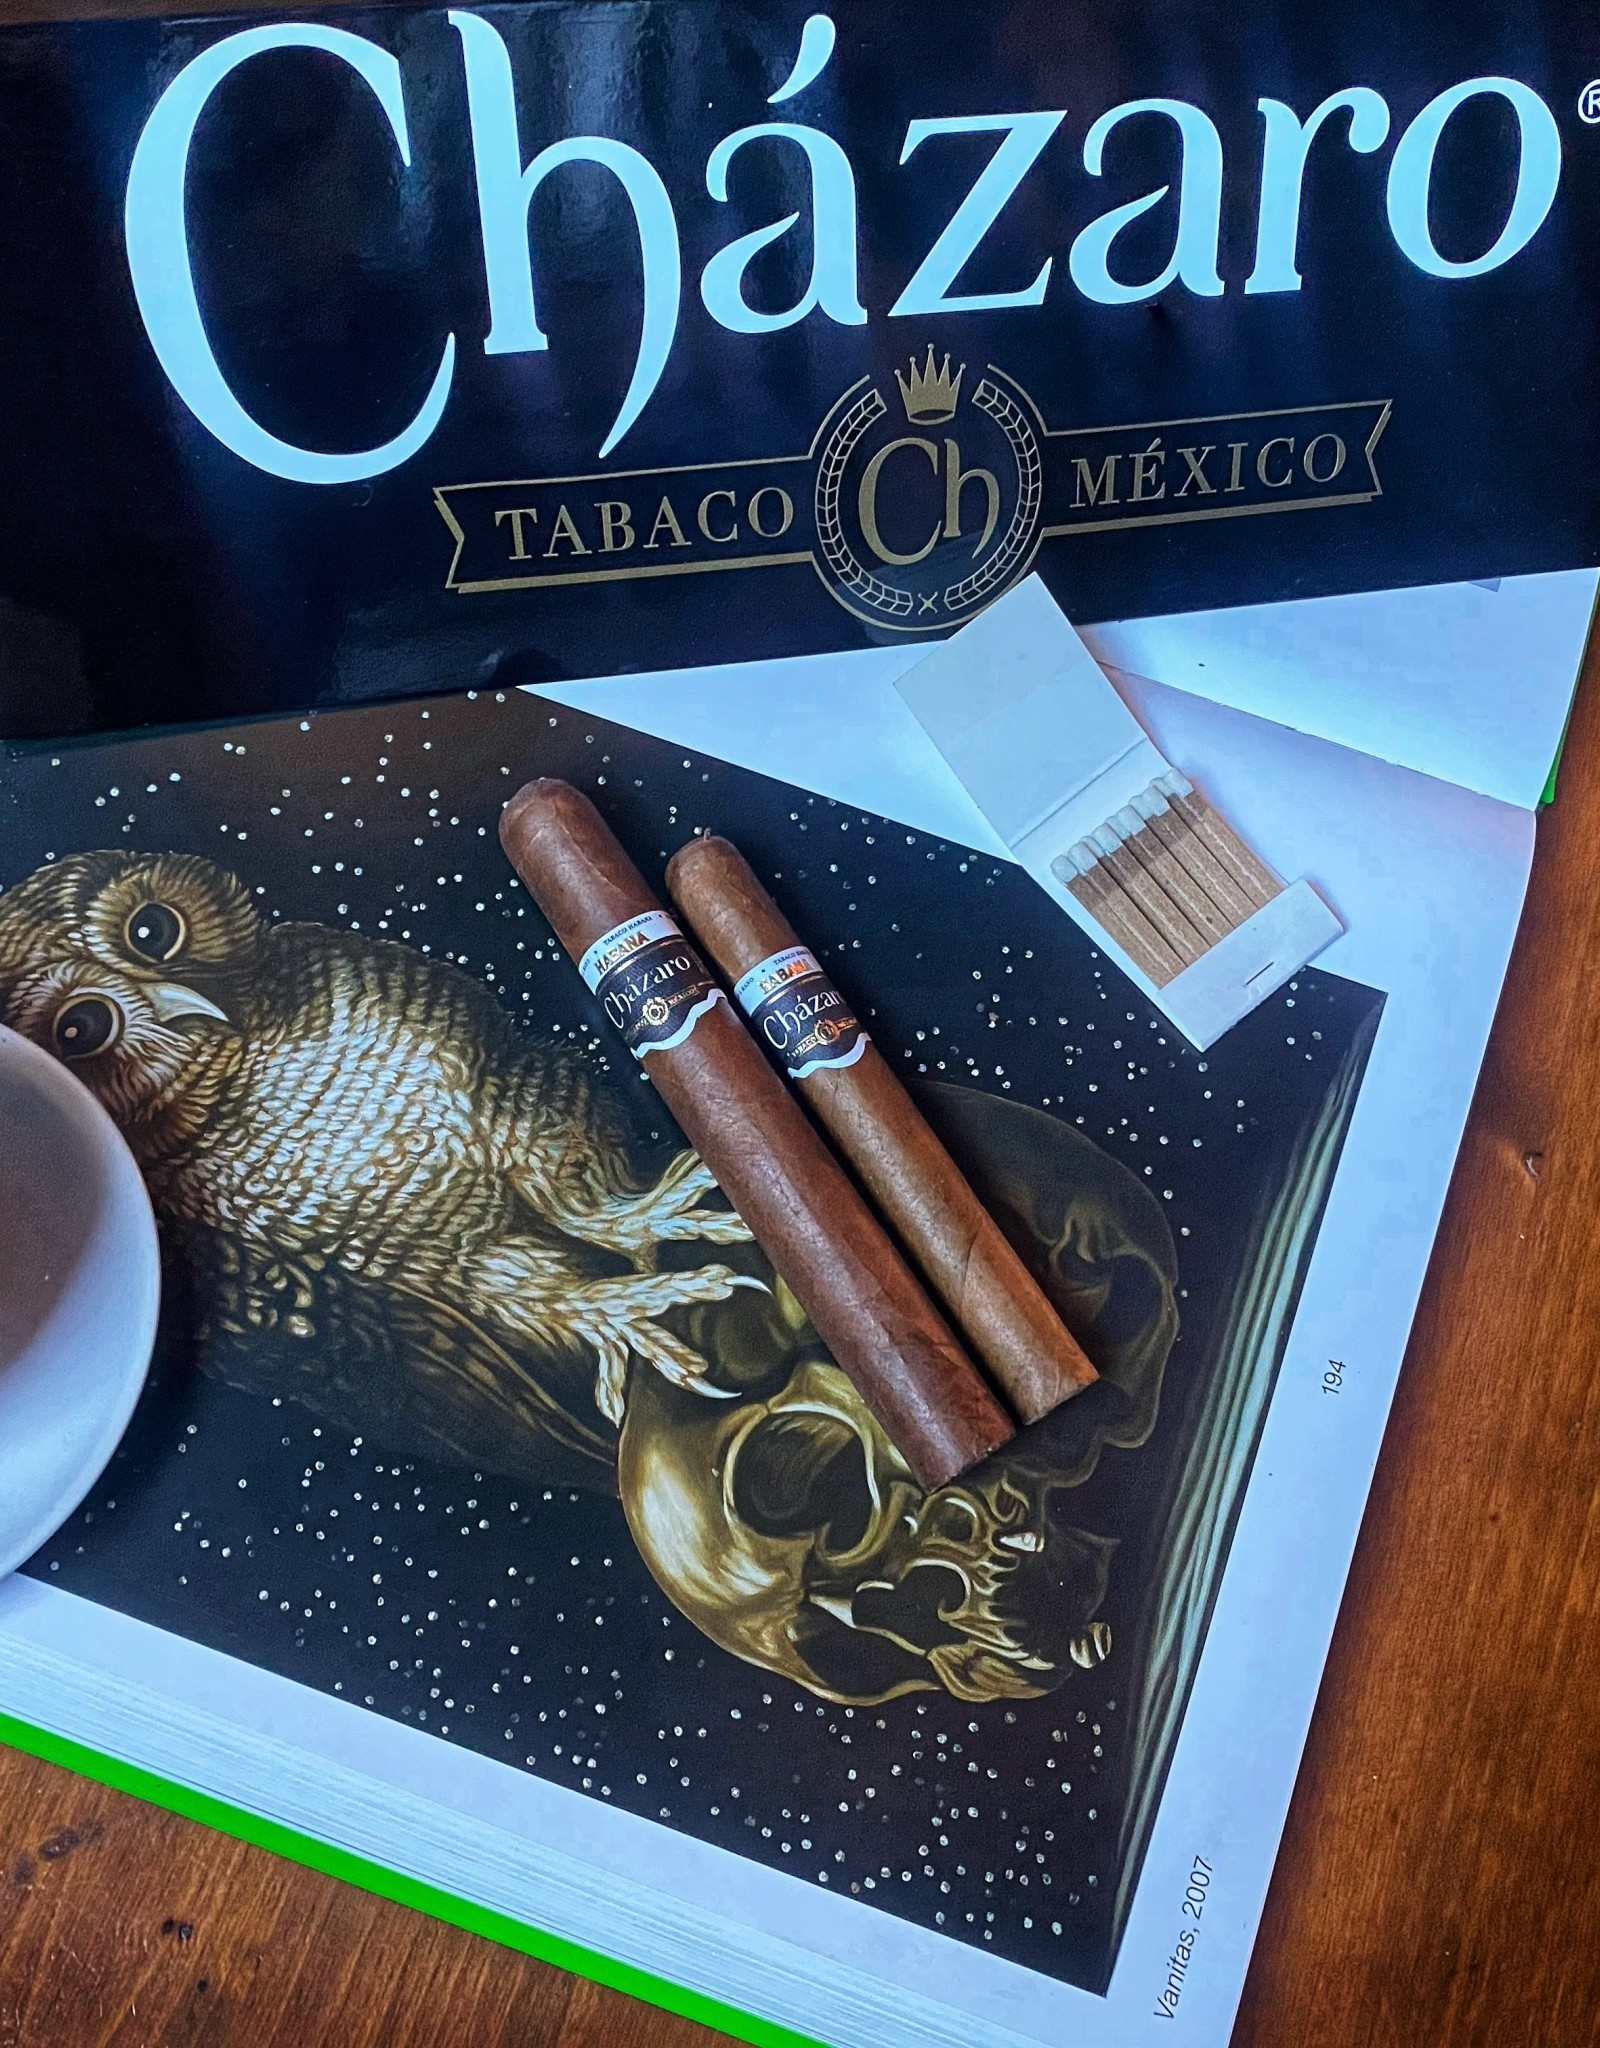 Black Chazaro Black Chazaro Habano Robusto 4.75 x 50